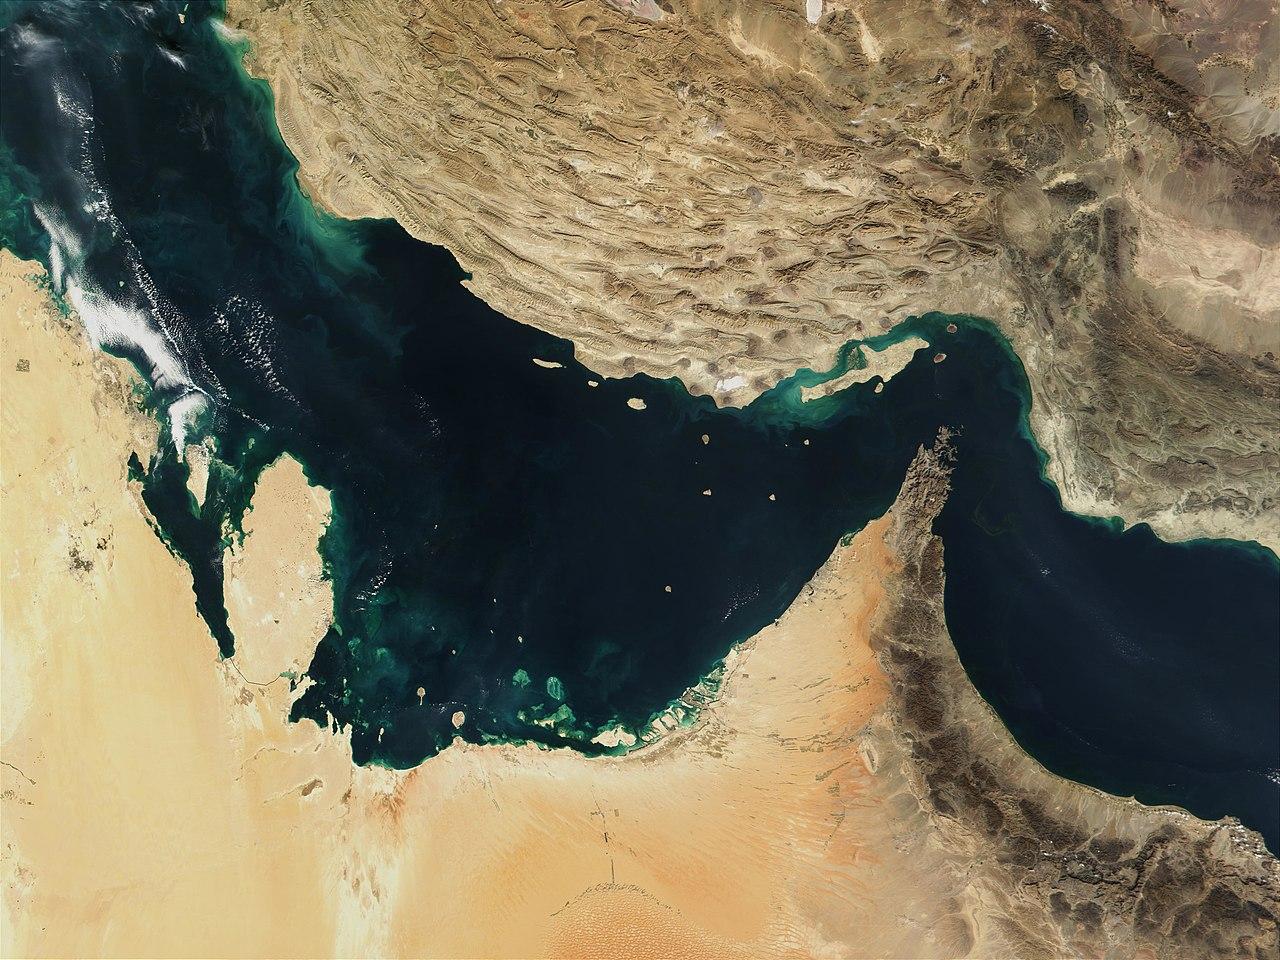 Iran's Bahrain campaign enters a dangerous new phase